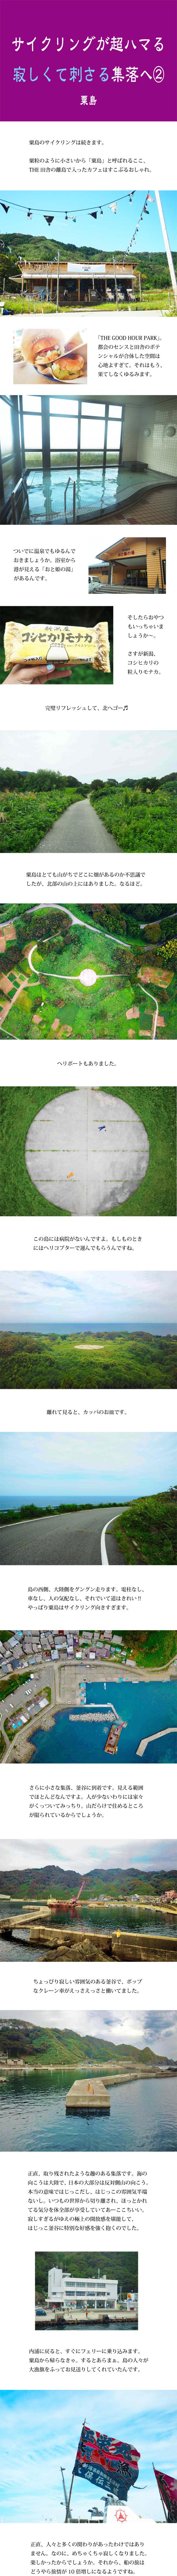 tomako181026.jpg